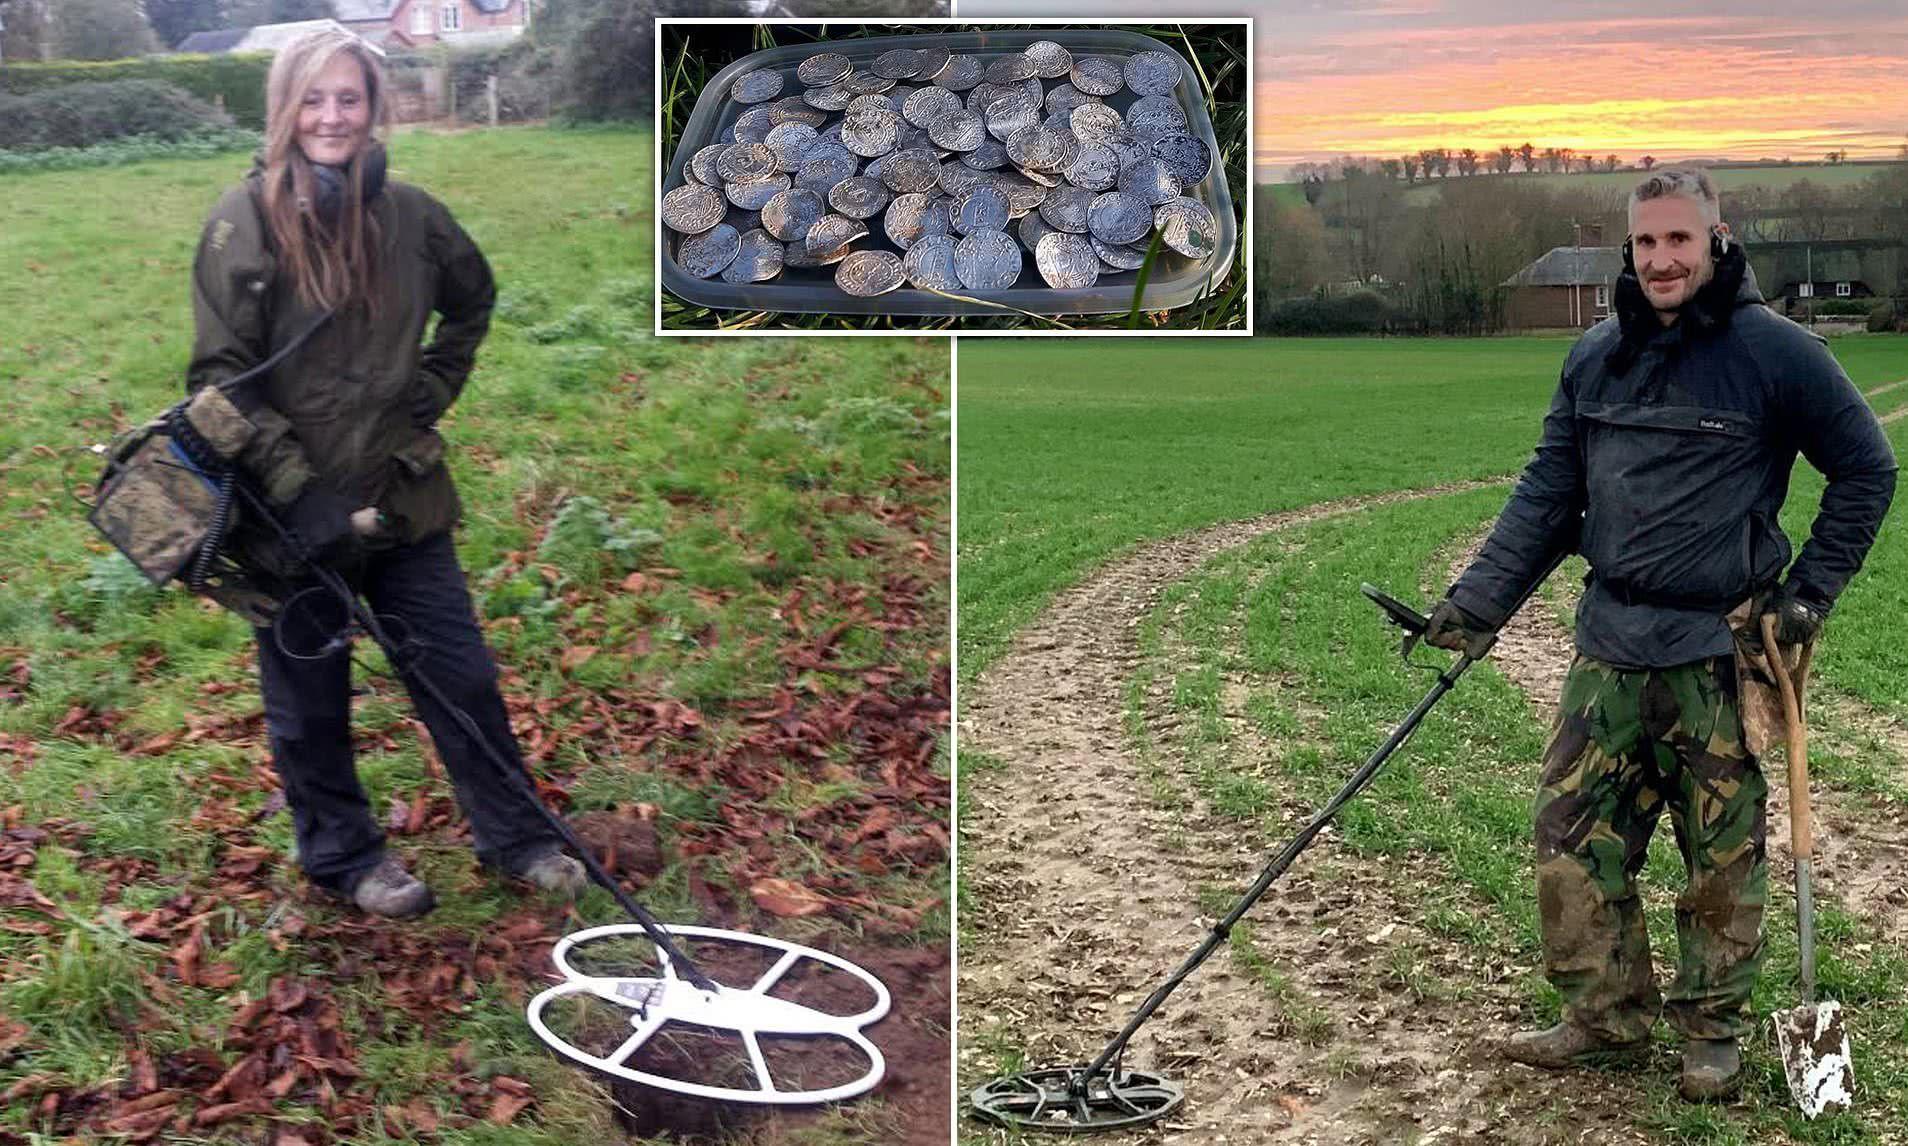 <b>夫妻俩用金属探测仪发现数千枚千年古币,上交国家后将获千万补偿</b>